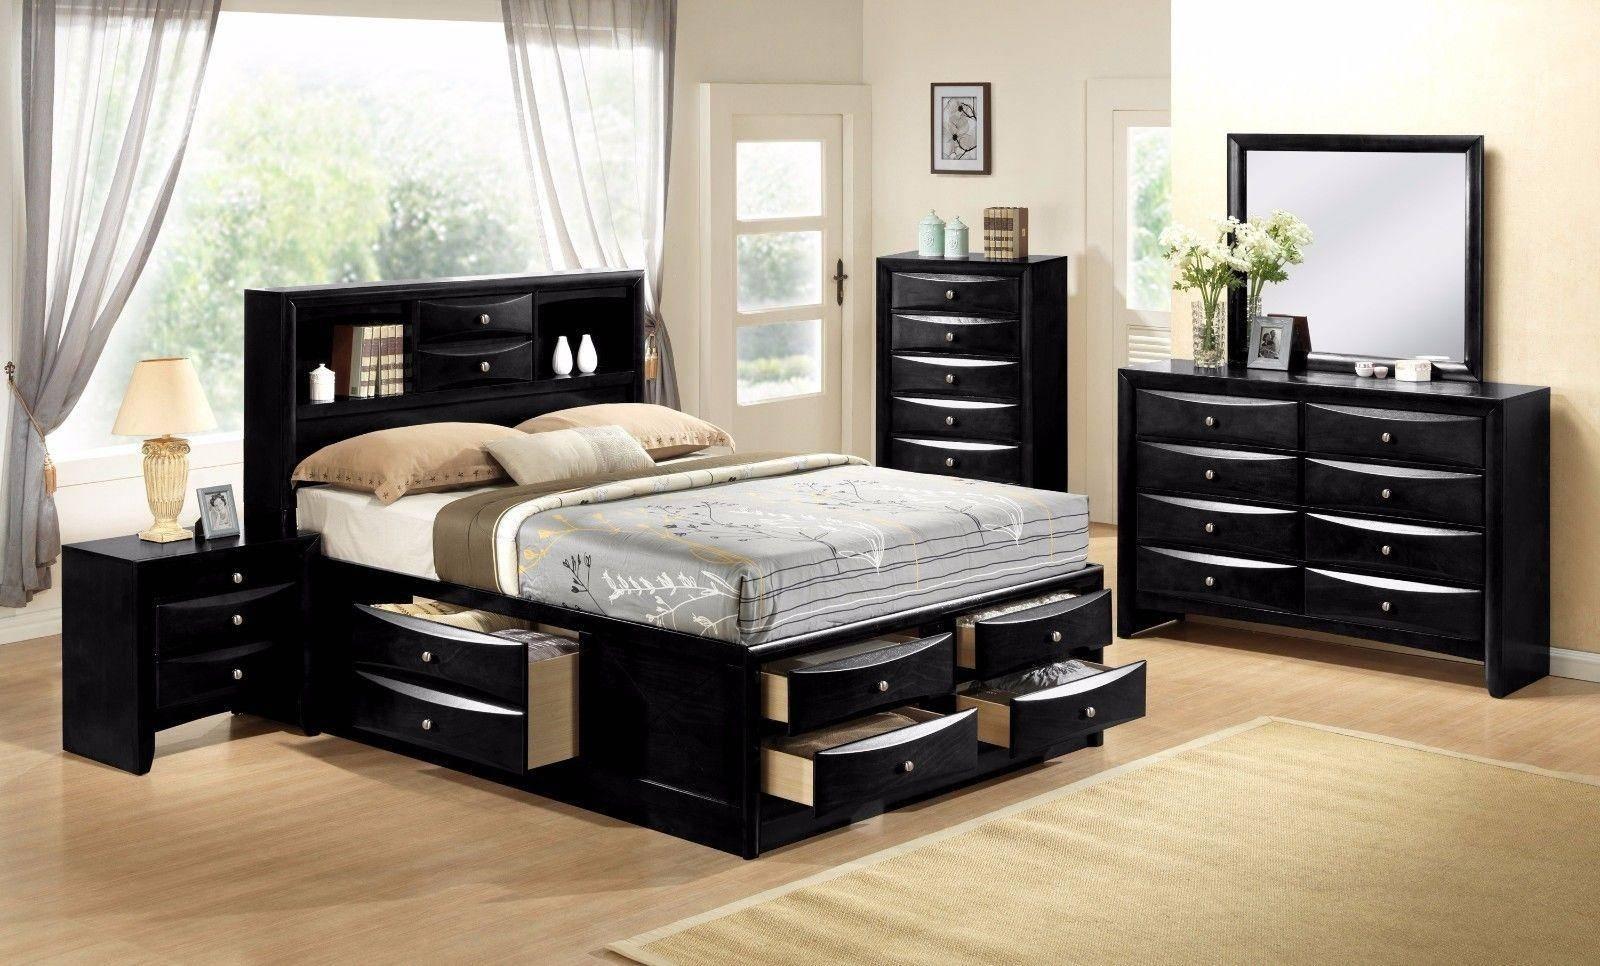 Buy Crown Mark B4285 Emily King Storage Bedroom Set 3 Pcs In Black Faux Leather Online